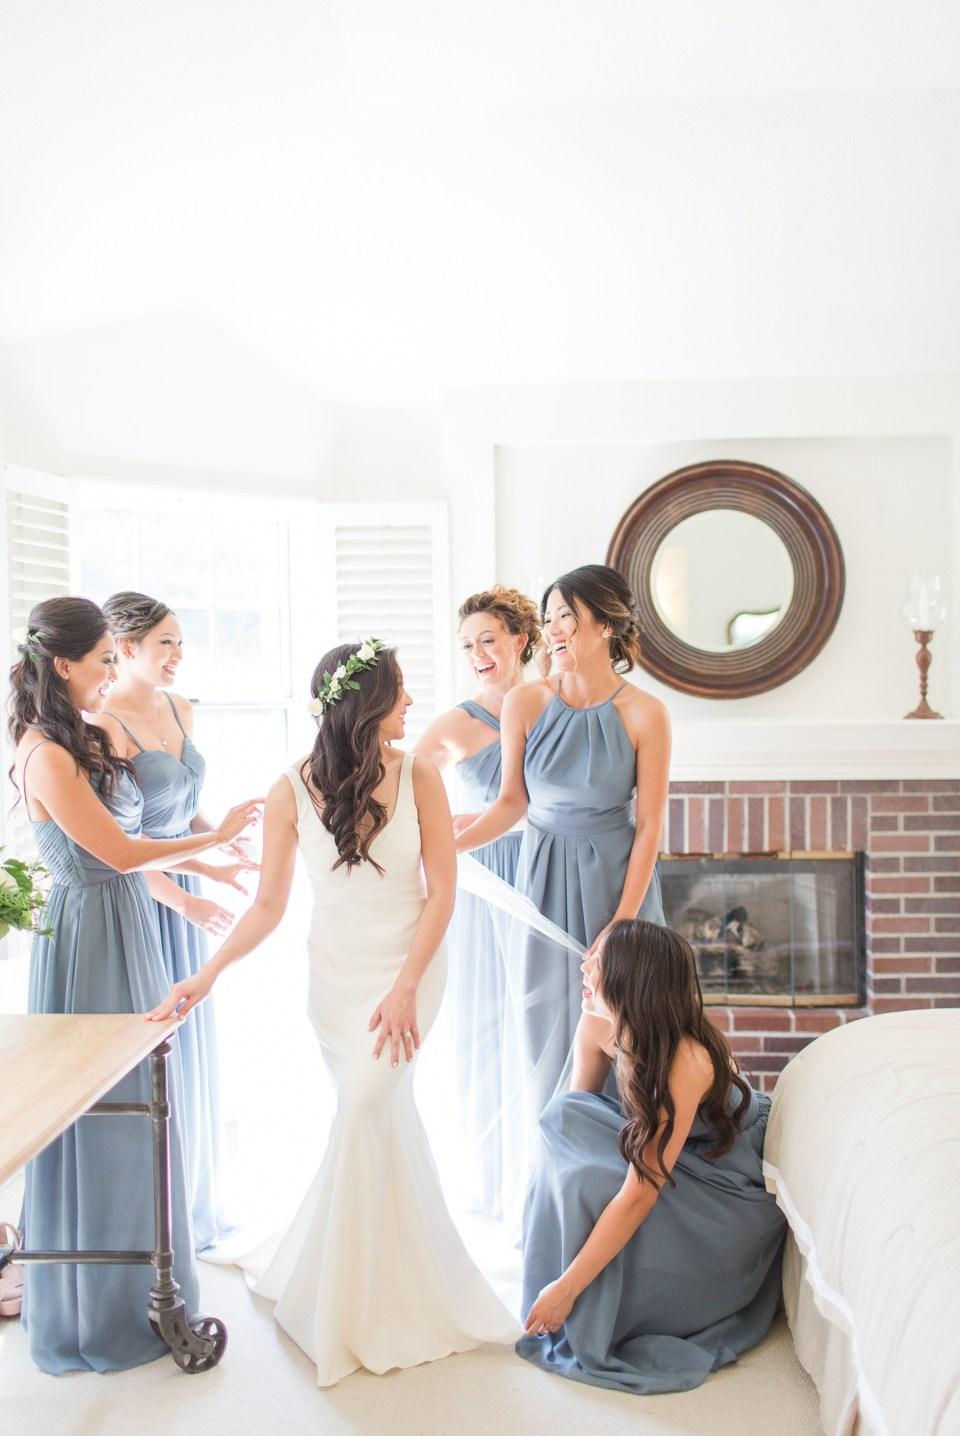 Kennedy Blue Bridesmaids Dresses Images